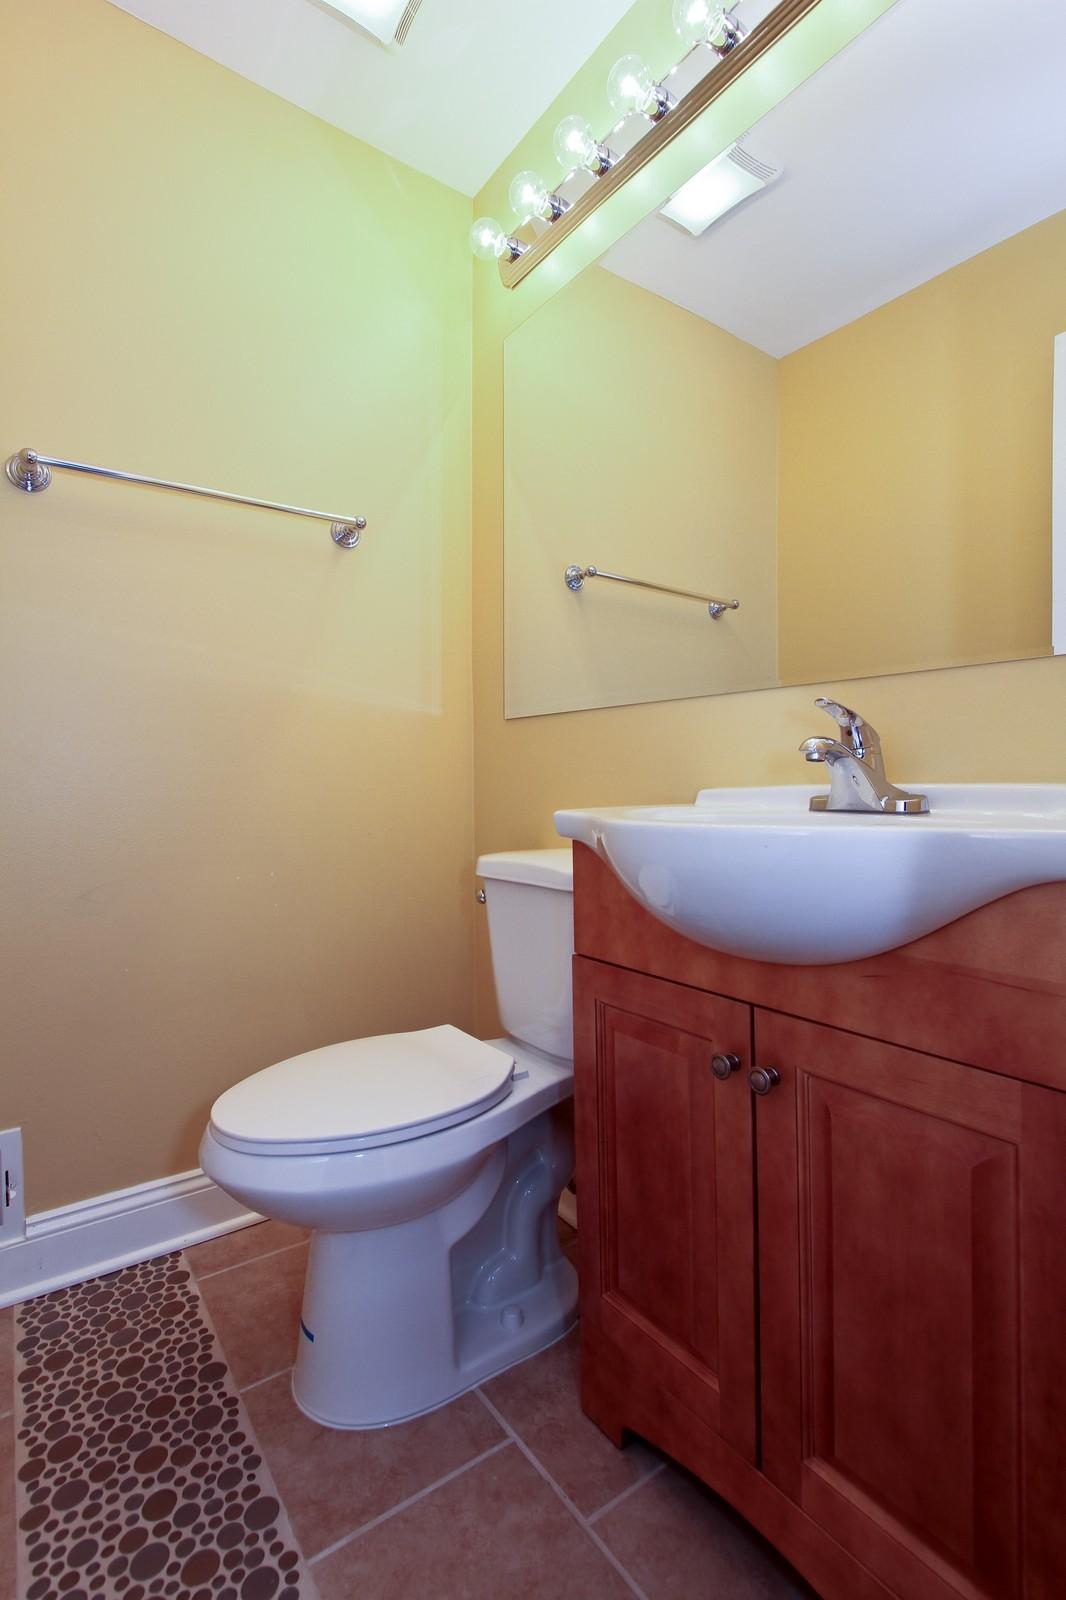 Real Estate Photography - 15435 Sunset, Dolton, IL, 60419 - Half Bath